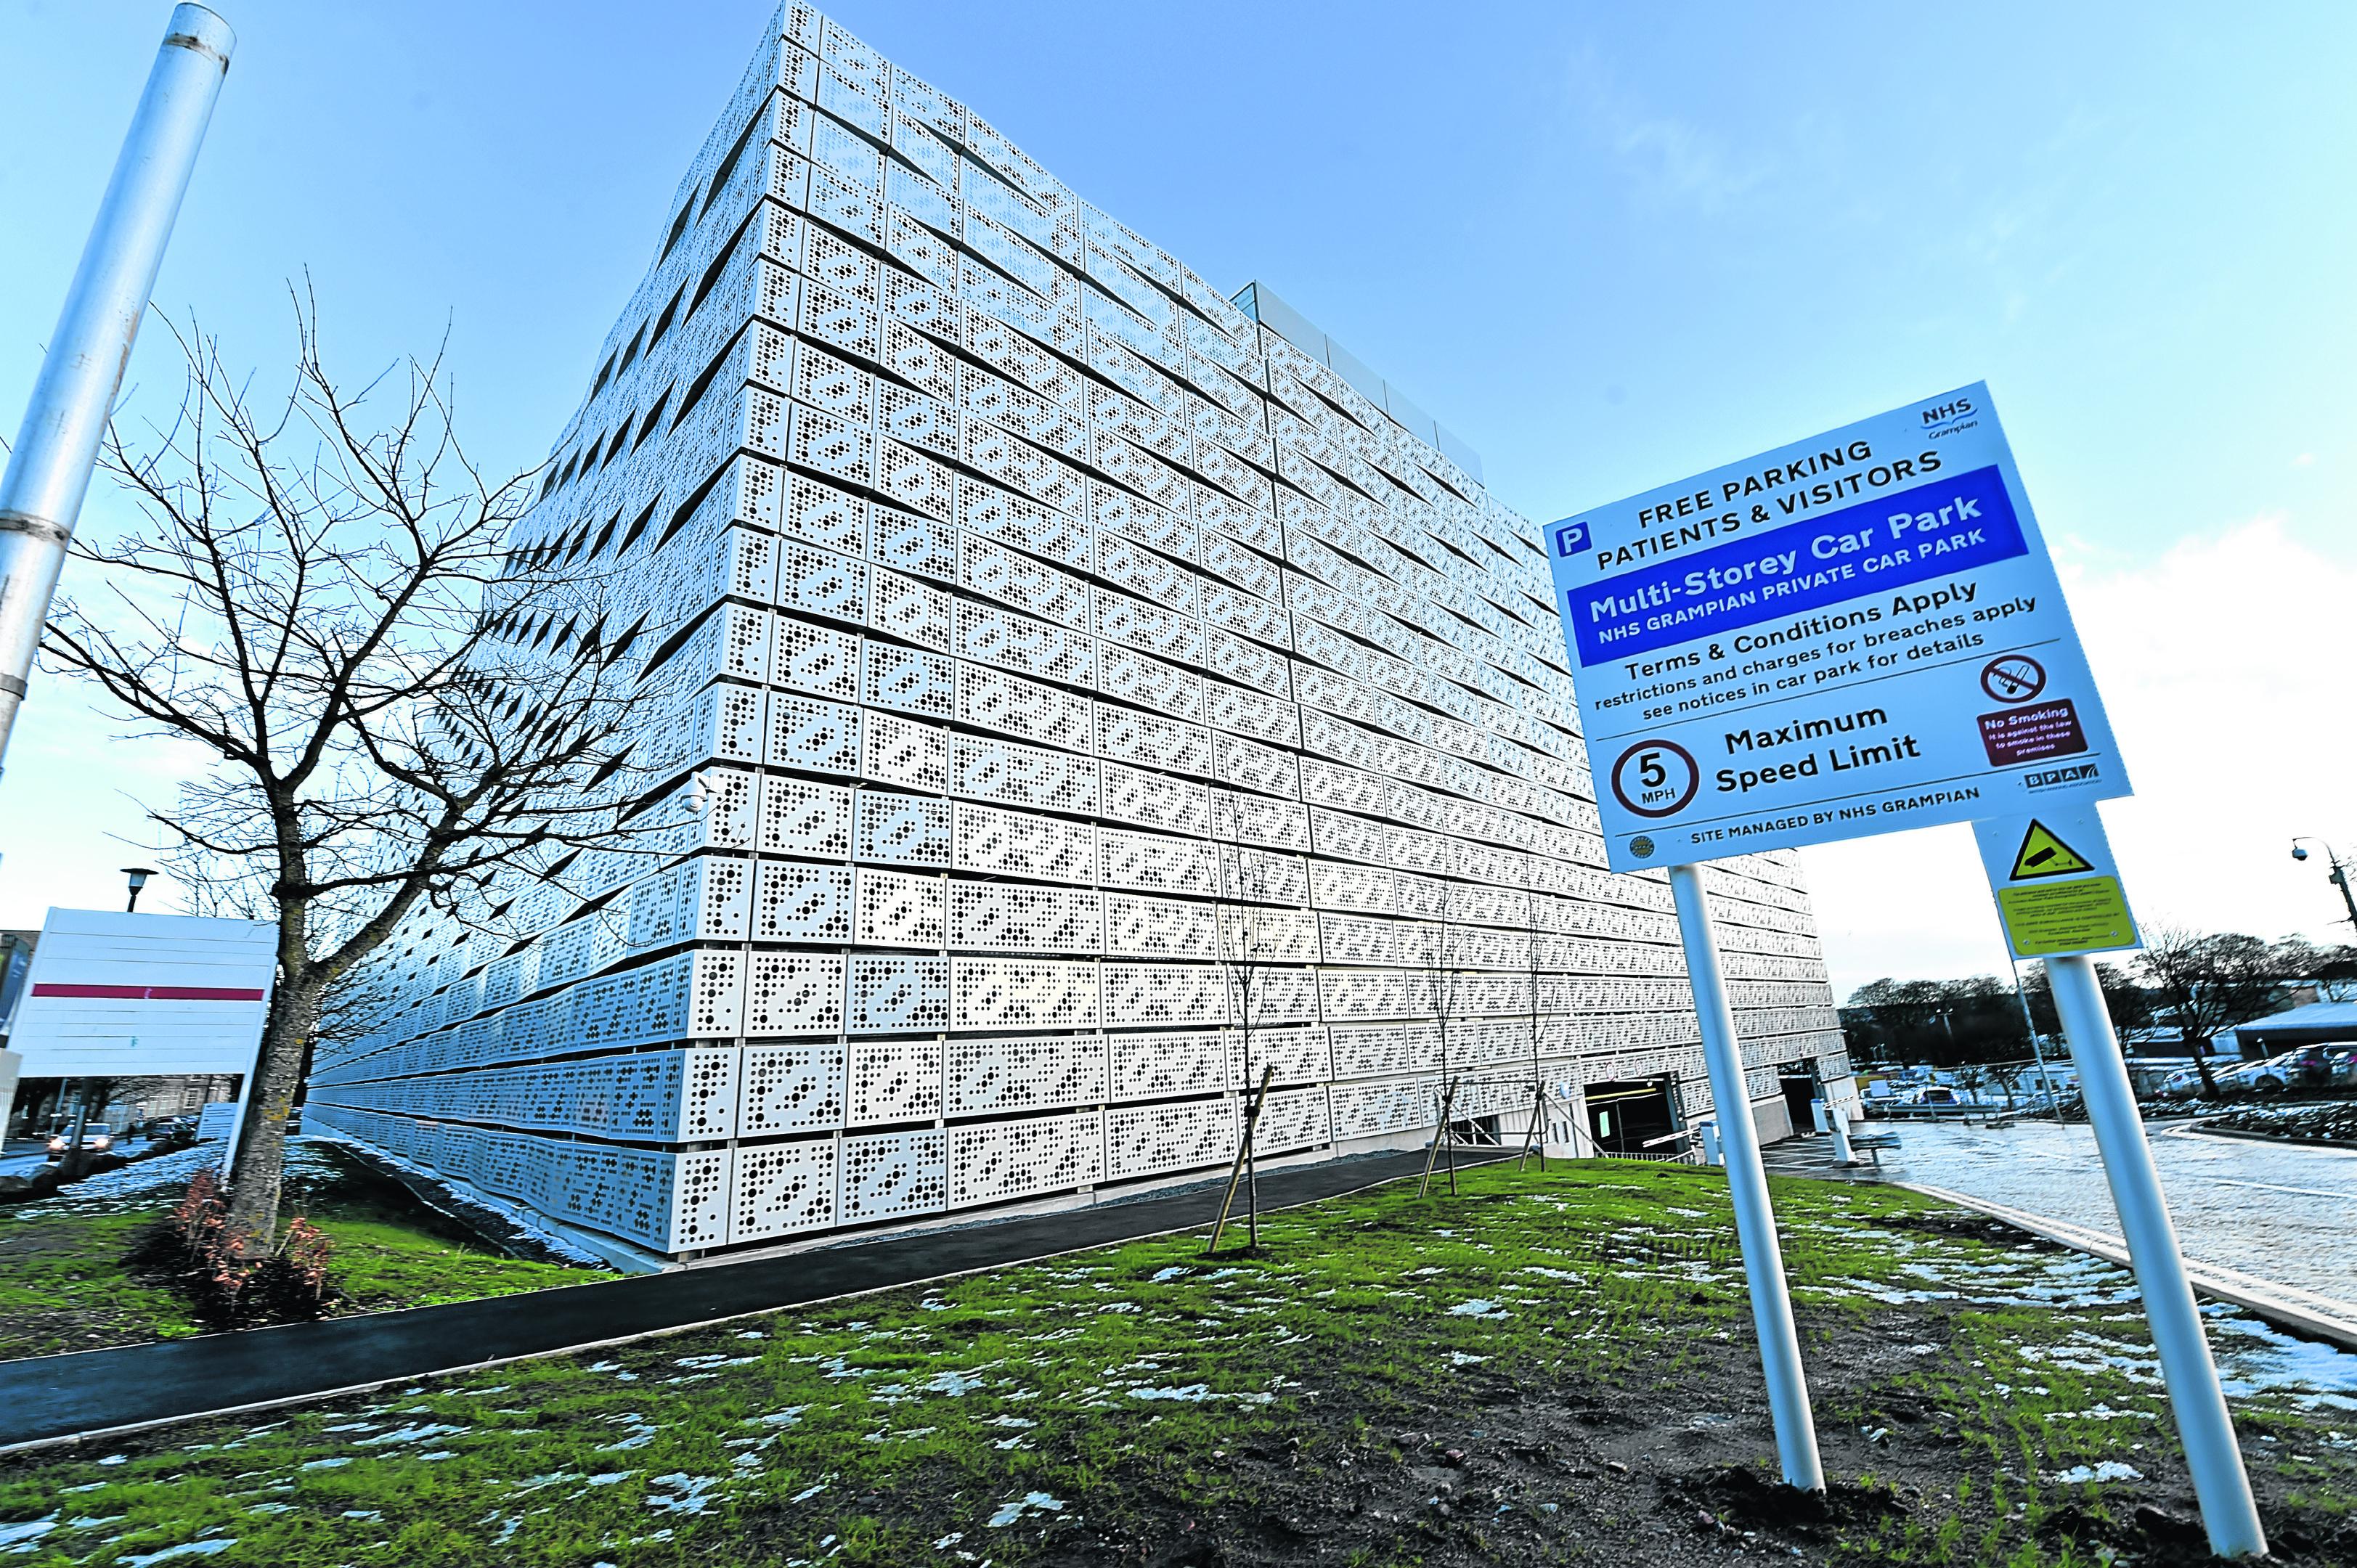 Aberdeen Royal Infirmary (ARI) car park